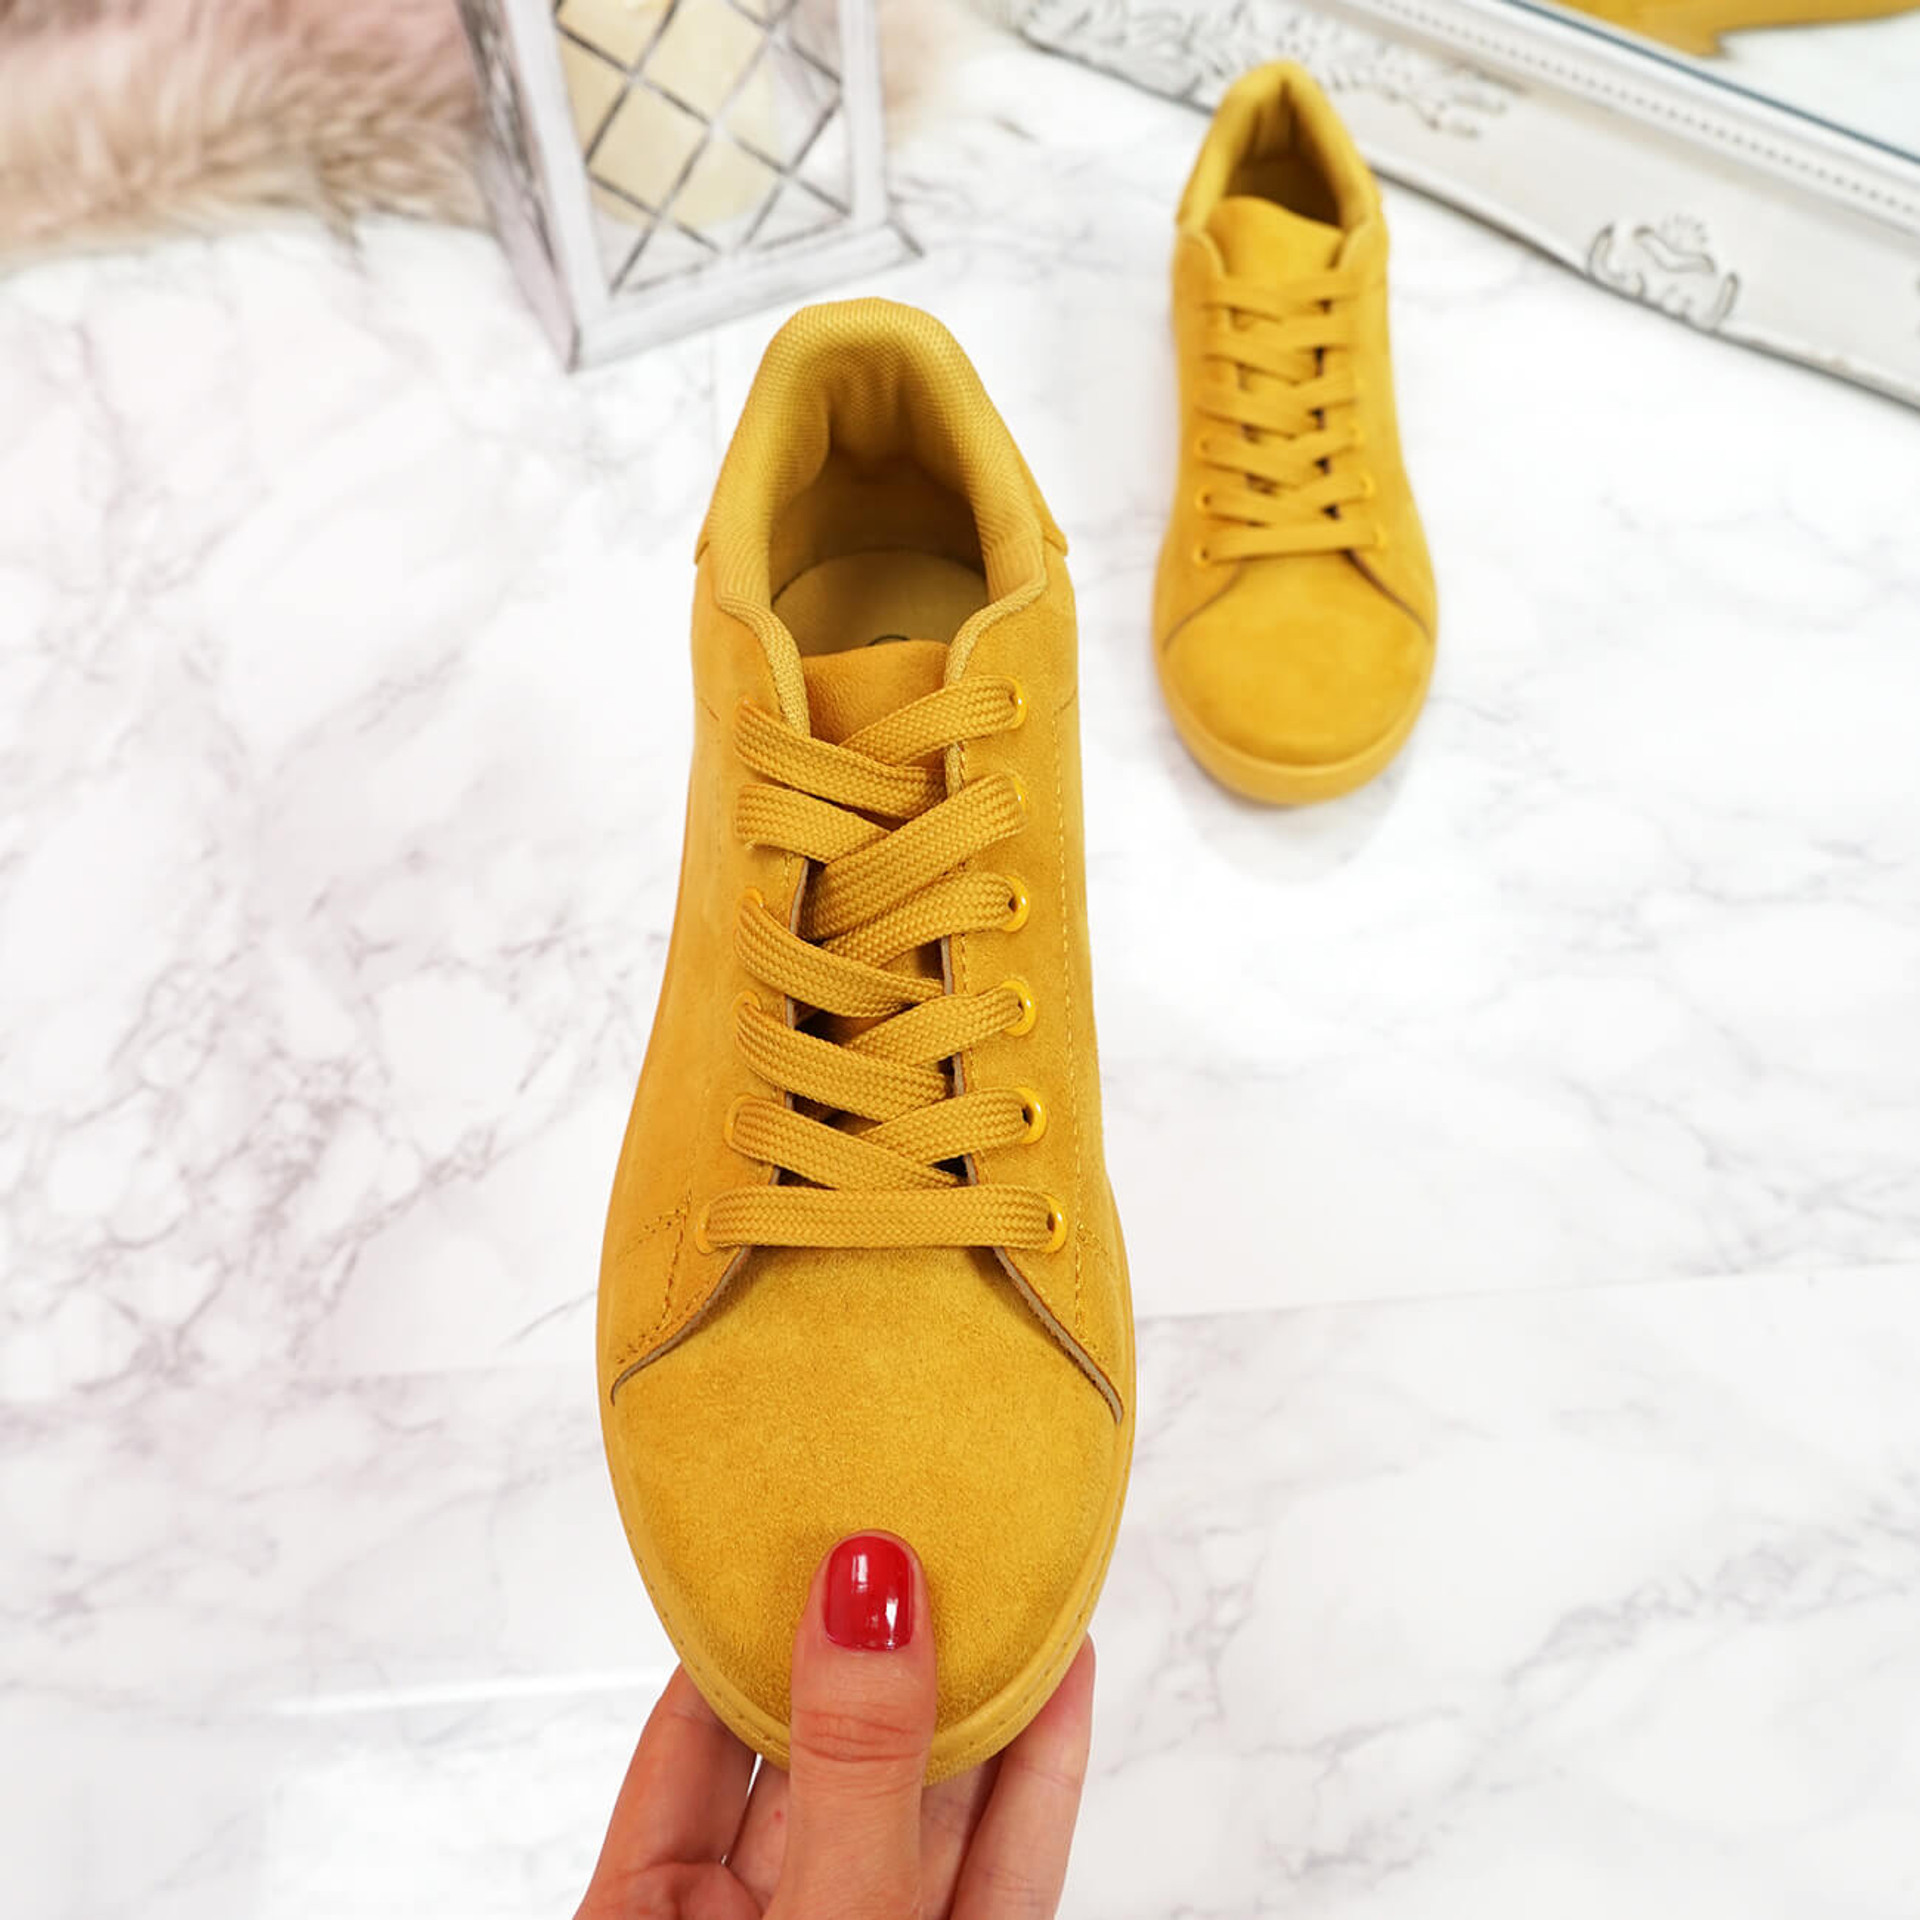 womens ladies lace up faux suede plimsolls casual comfy party uk women shoes size uk 3 4 5 6 7 8